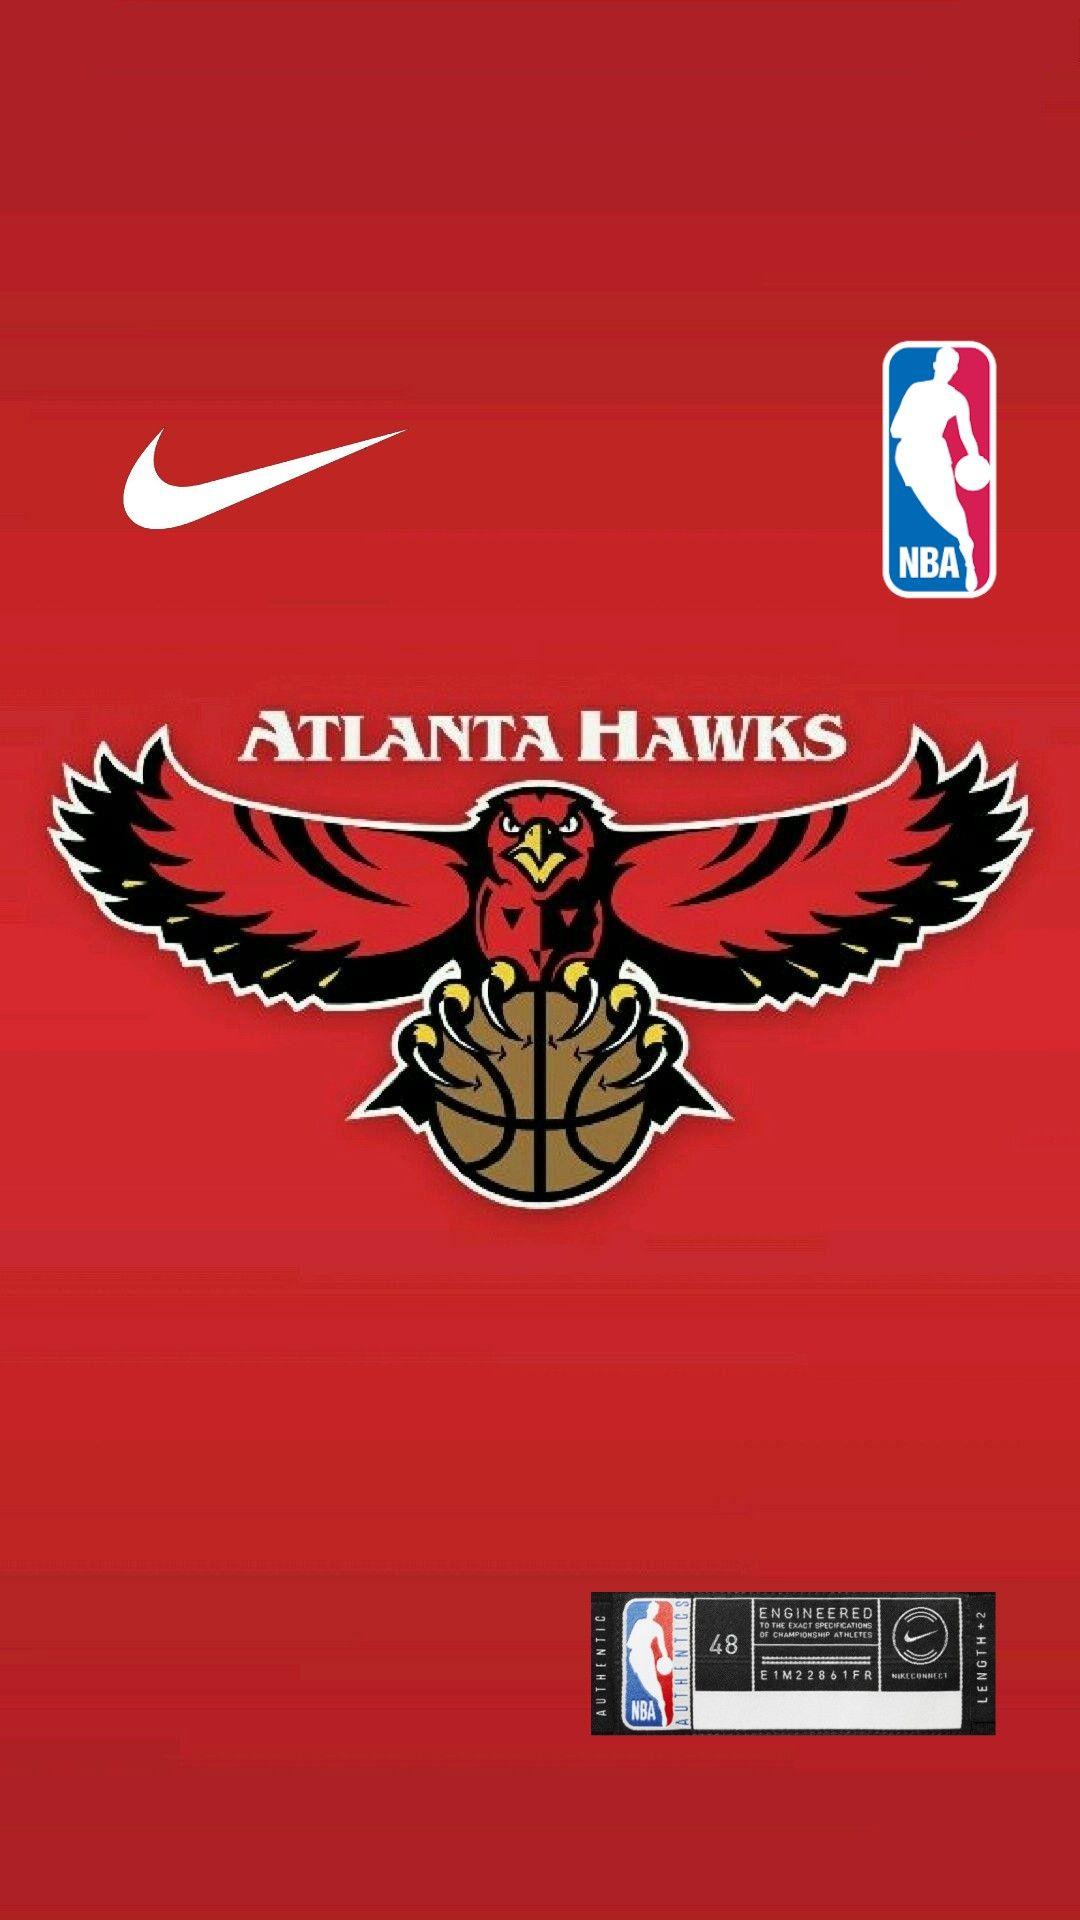 Pin By Tomas Duris On Nba Brand Poster Basket Logo Graphic Wallpaper